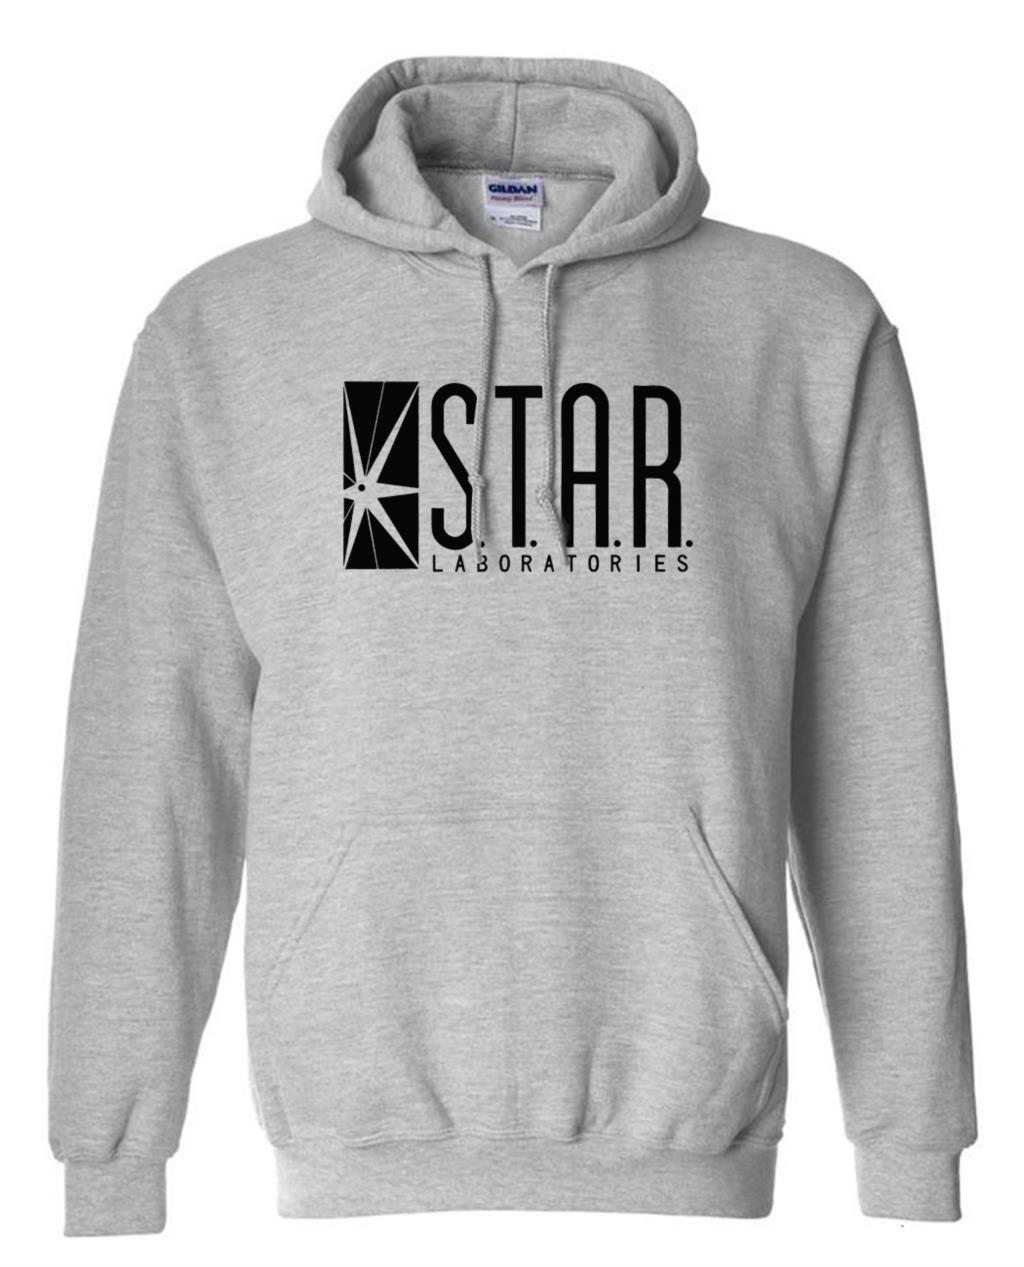 autumn brand hoodies superman series men hoody STAR S.T.A.R.labs jumper the flash gotham city comic books black sweatshirt 7